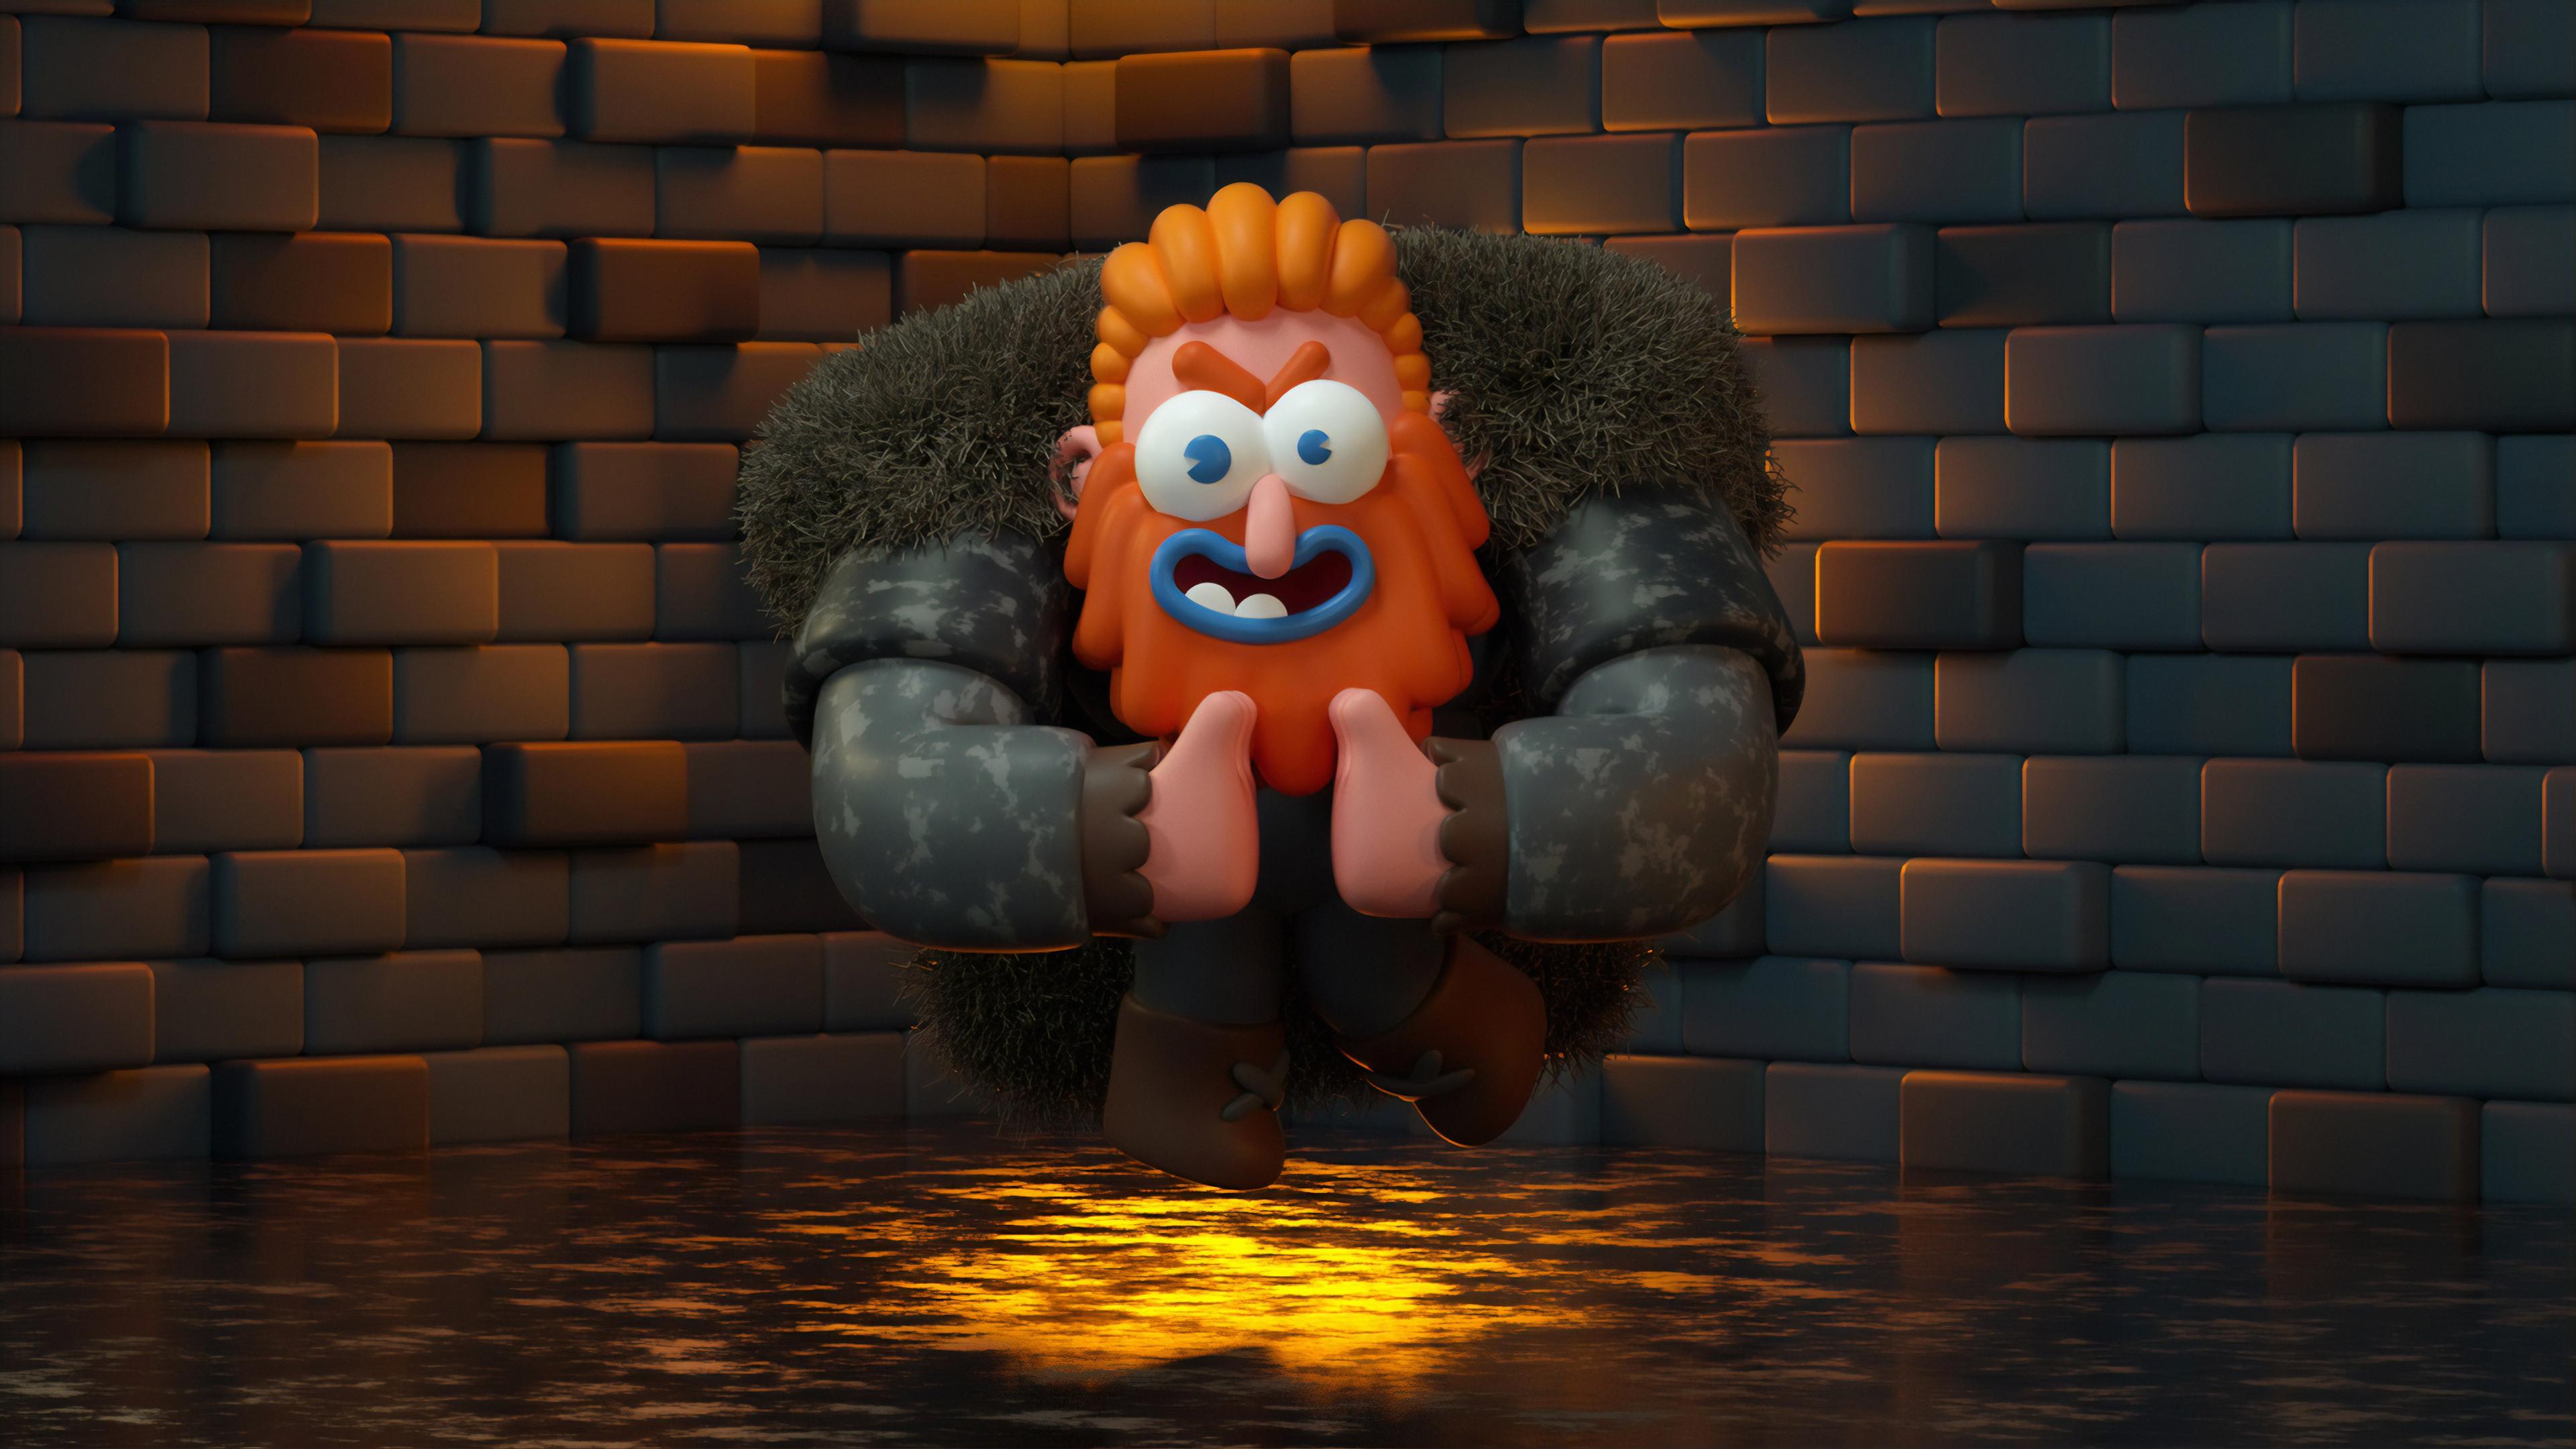 game of thrones cartoon 1577915092 - Game Of Thrones Cartoon -